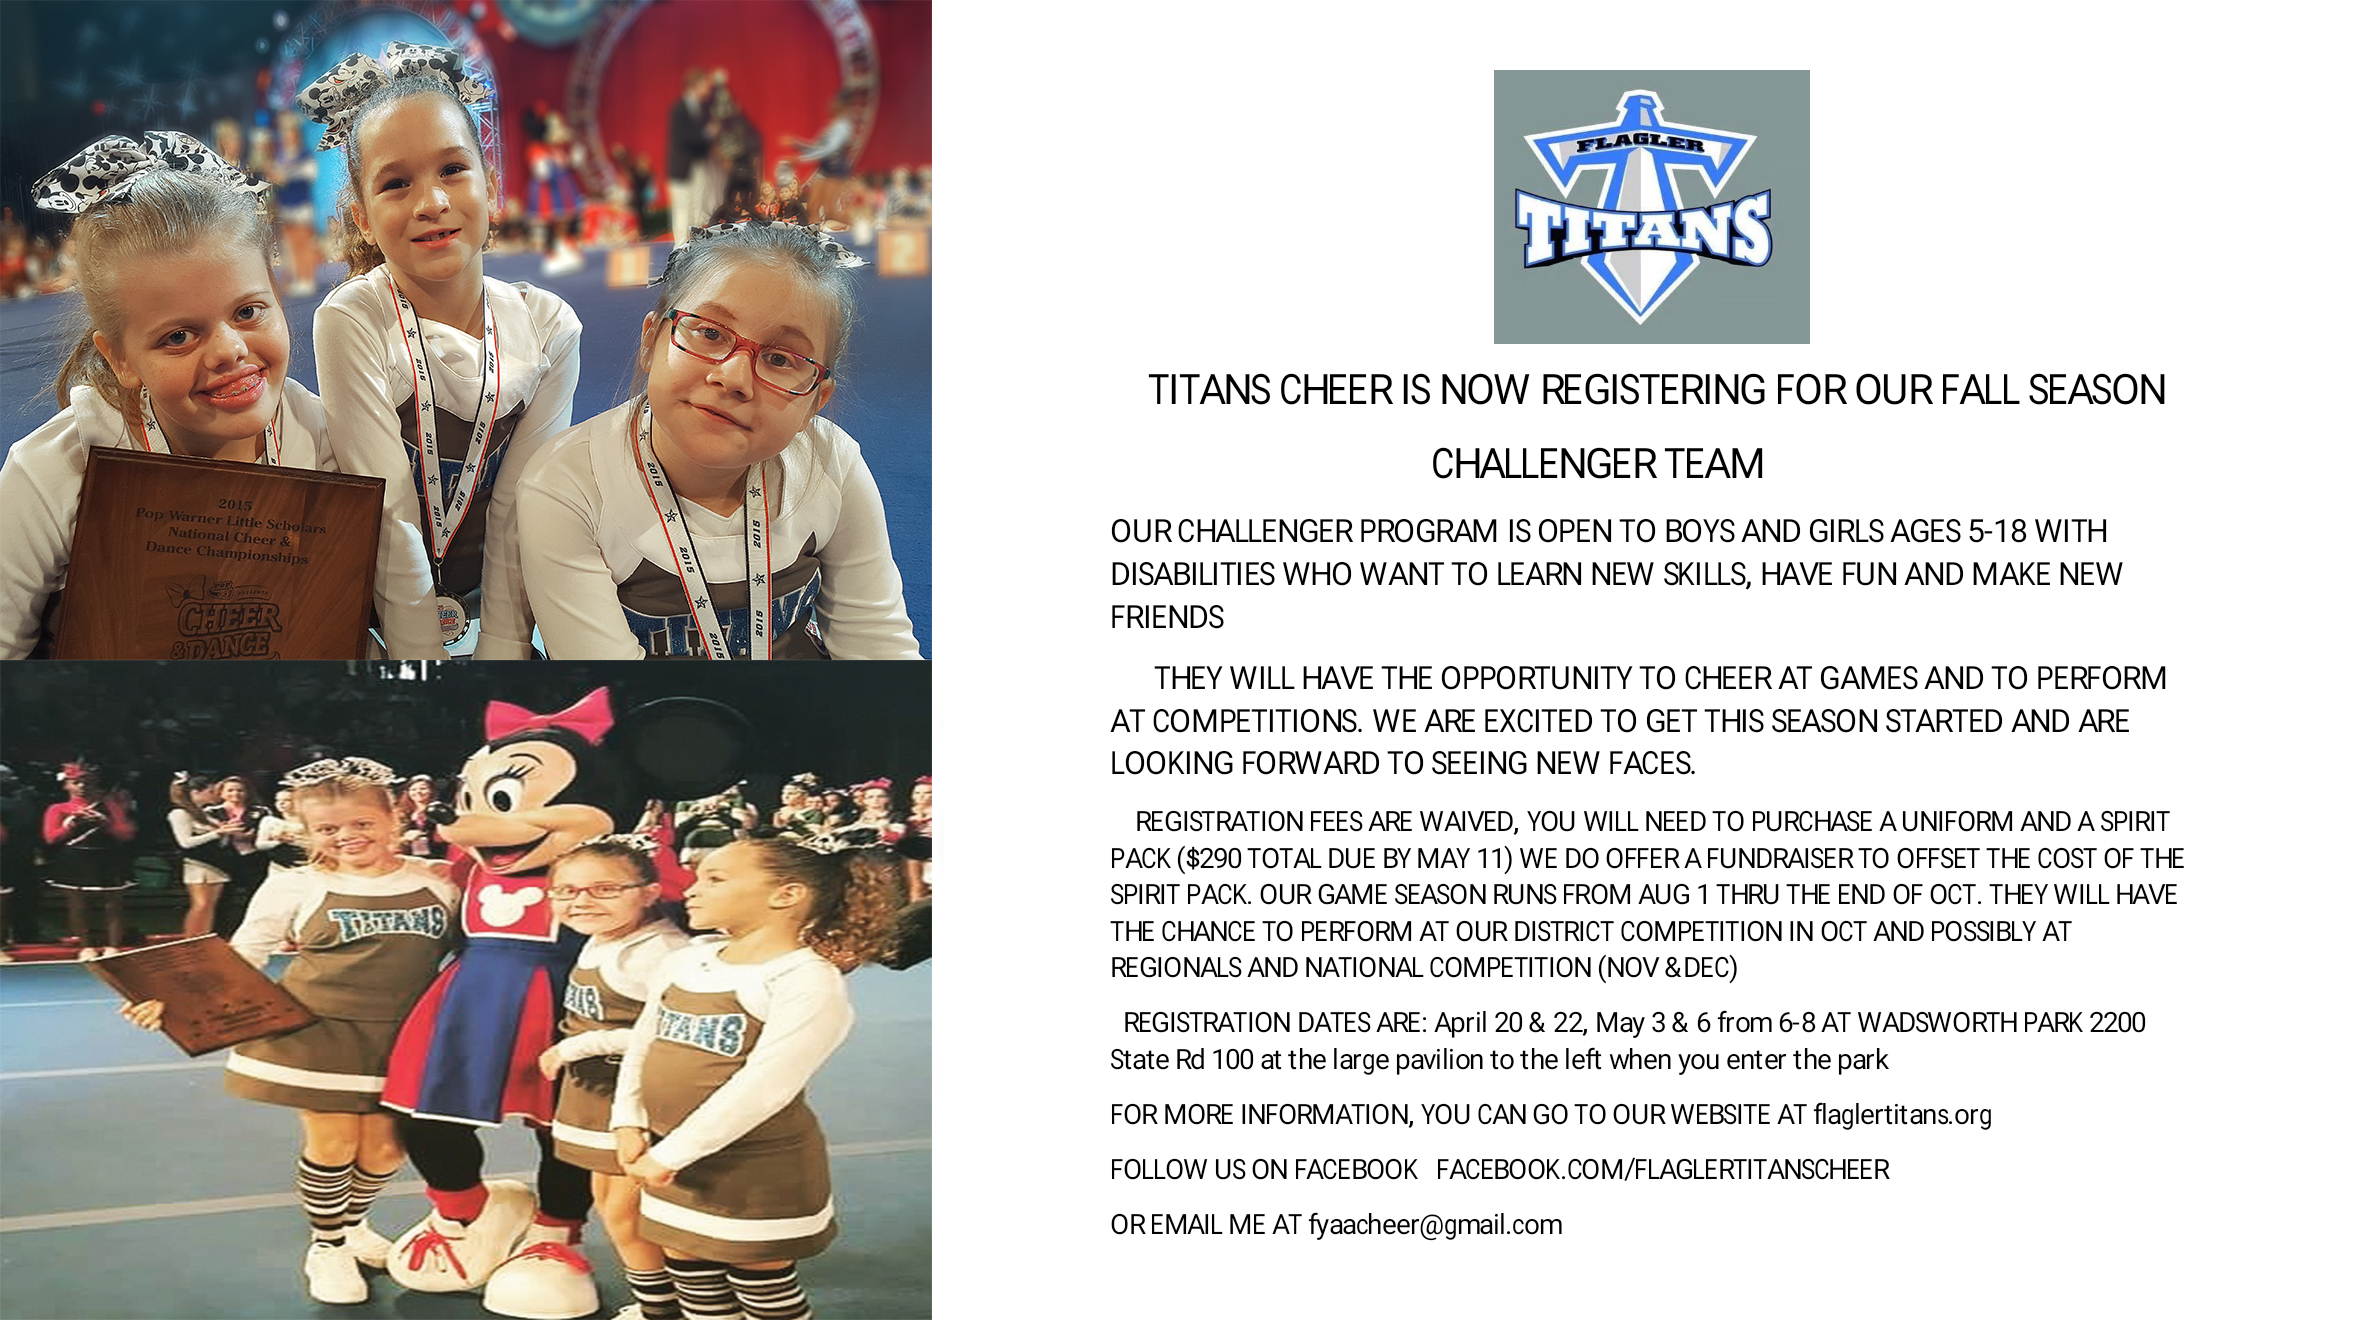 Titans Cheer